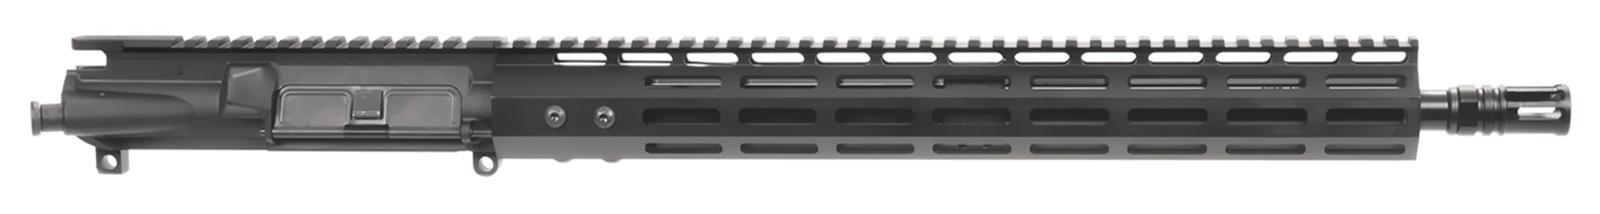 ar-15-upper-assembly-16-7-62x39-1-10-15-cbc-m-lok-ar-15-handguard-rail-compensator-california-compliant